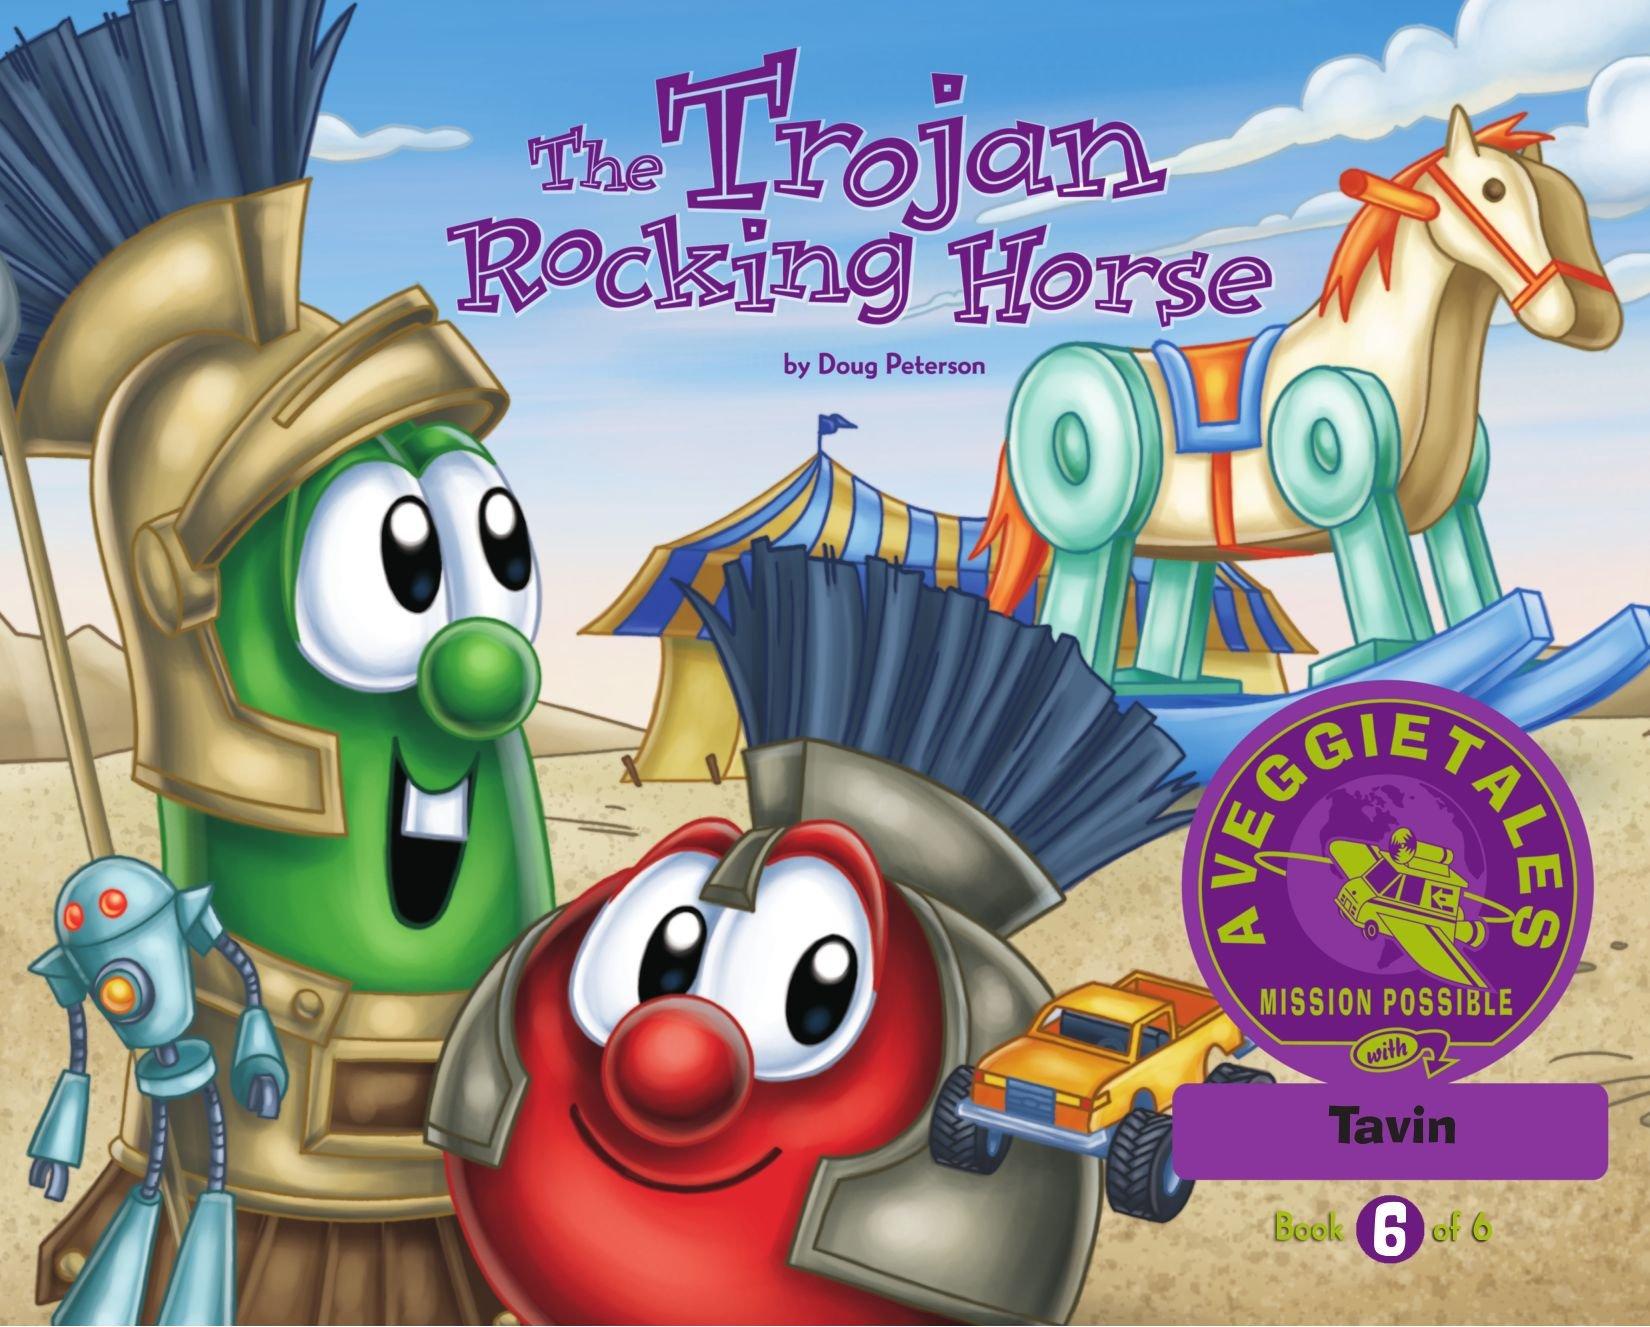 The Trojan Rocking Horse - VeggieTales Mission Possible Adventure Series #6: Personalized for Tavin (Girl) pdf epub